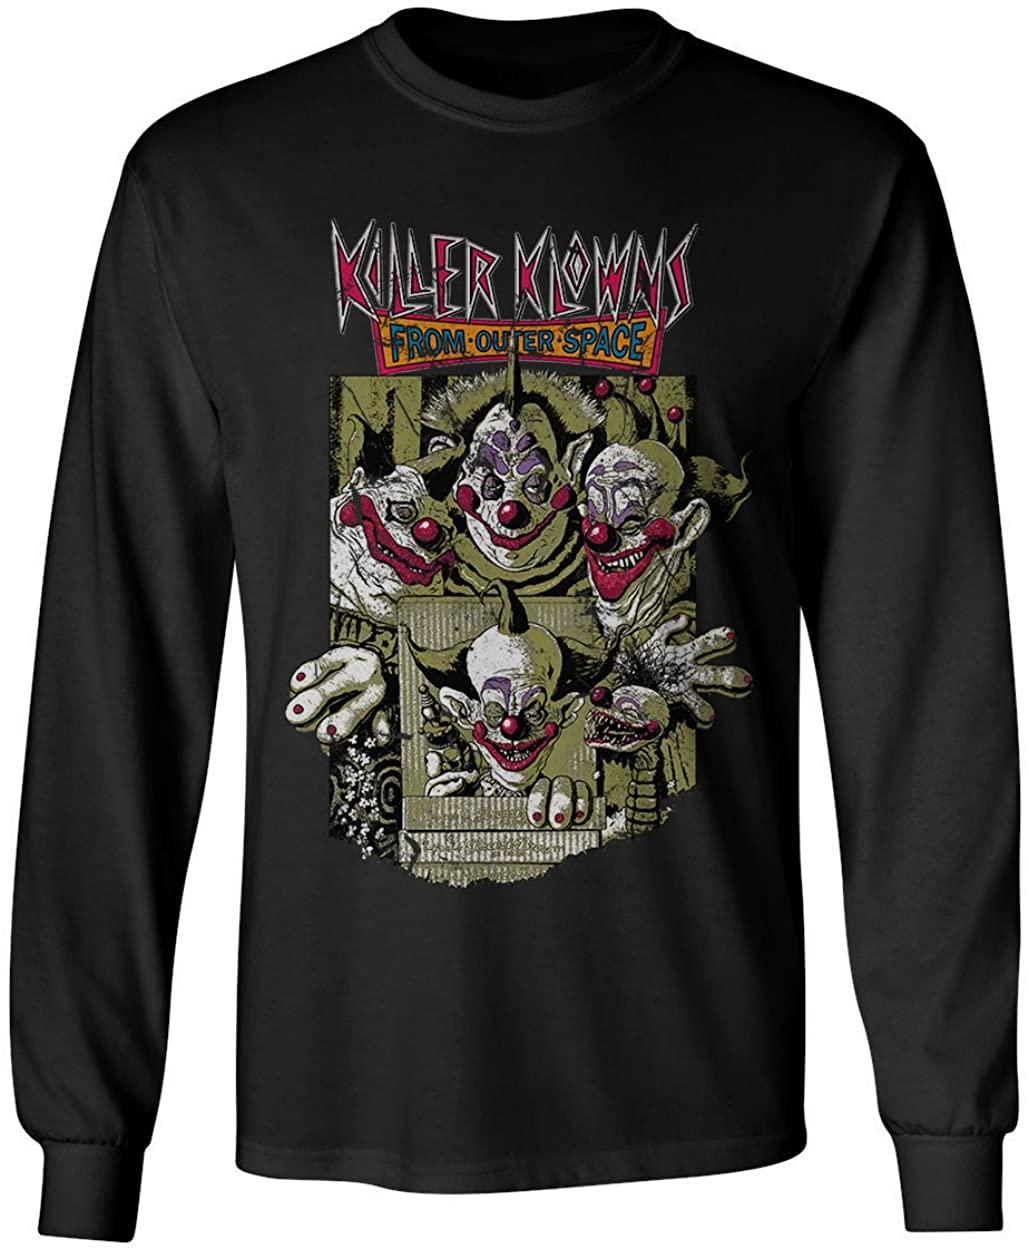 RIVEBELLA New Graphic Shirt Cult Horror Movie Novelty Tee Killer Klown Mens Long Sleeve T-Shirt